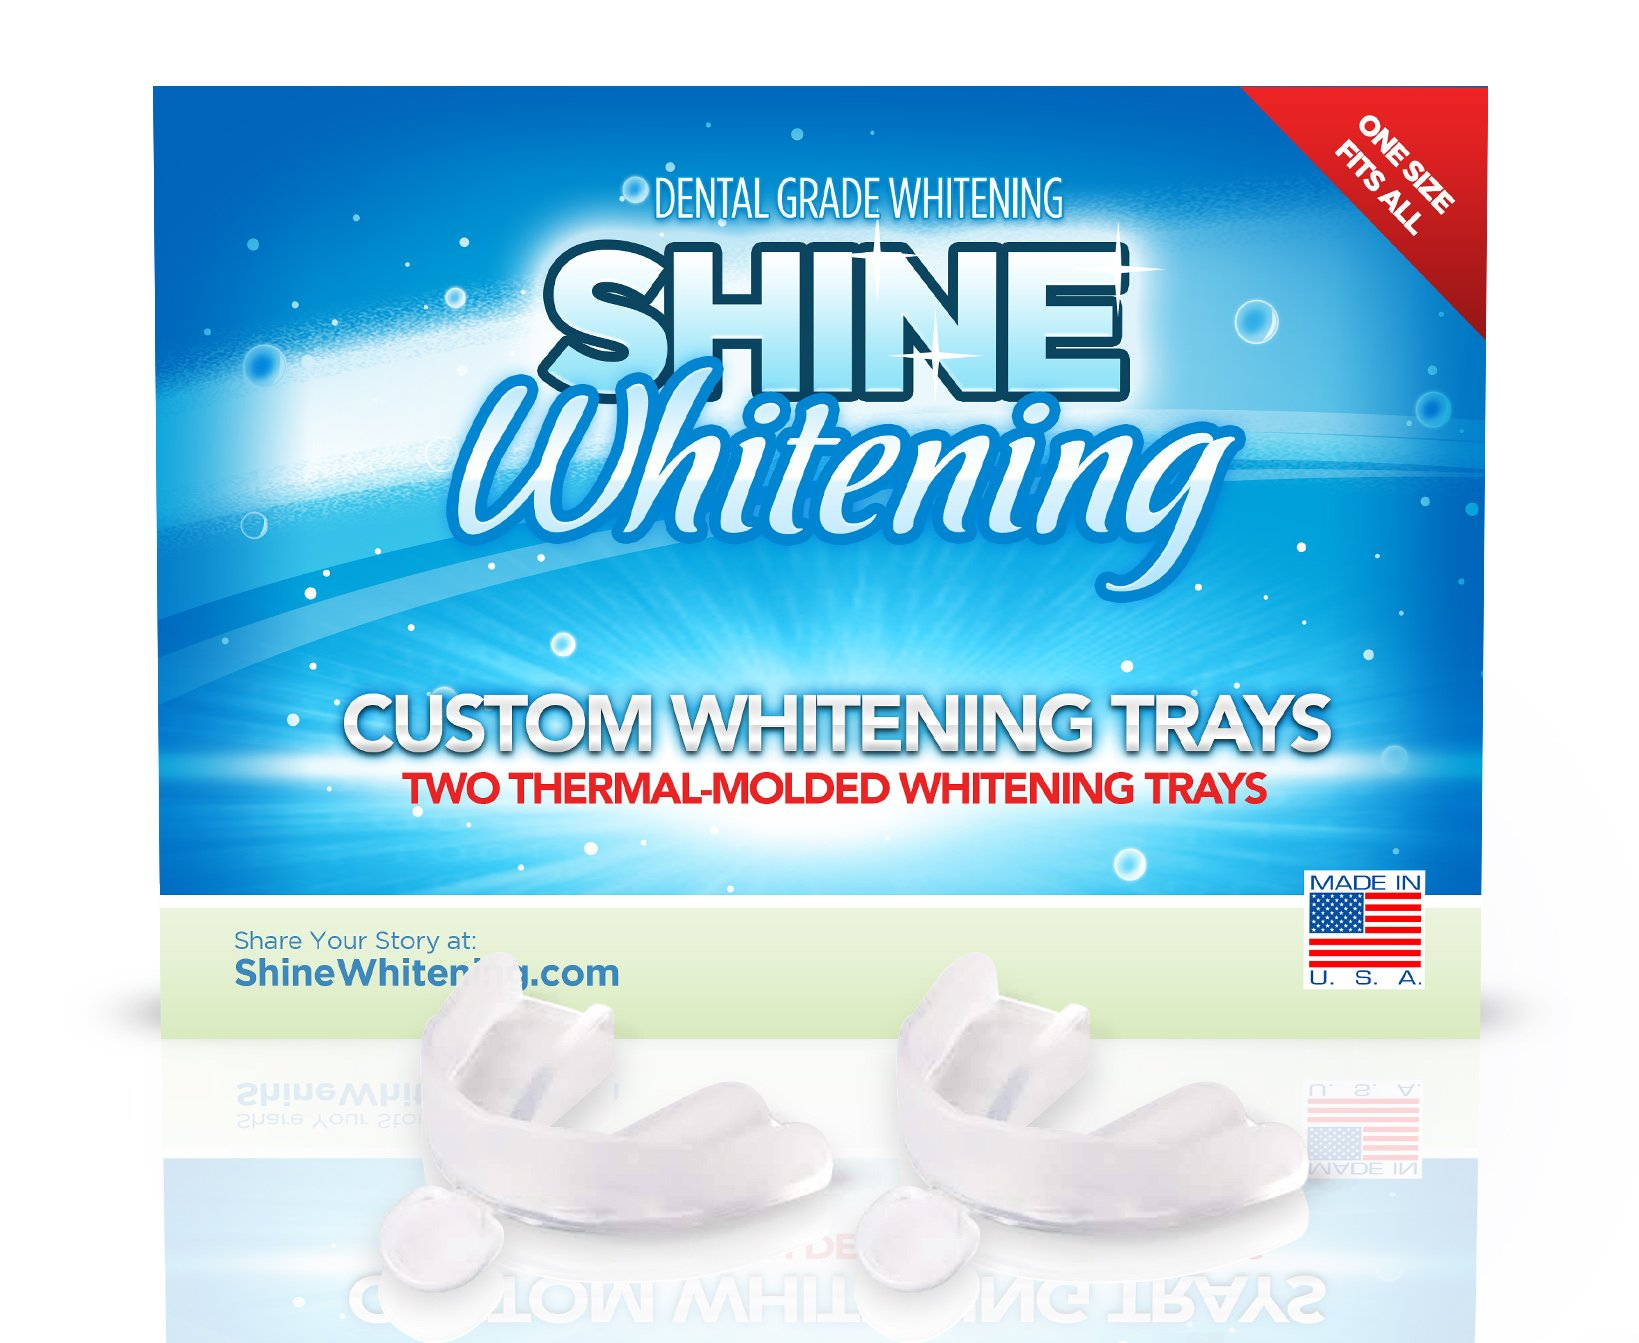 Shine Whitening Teeth Whitening Trays